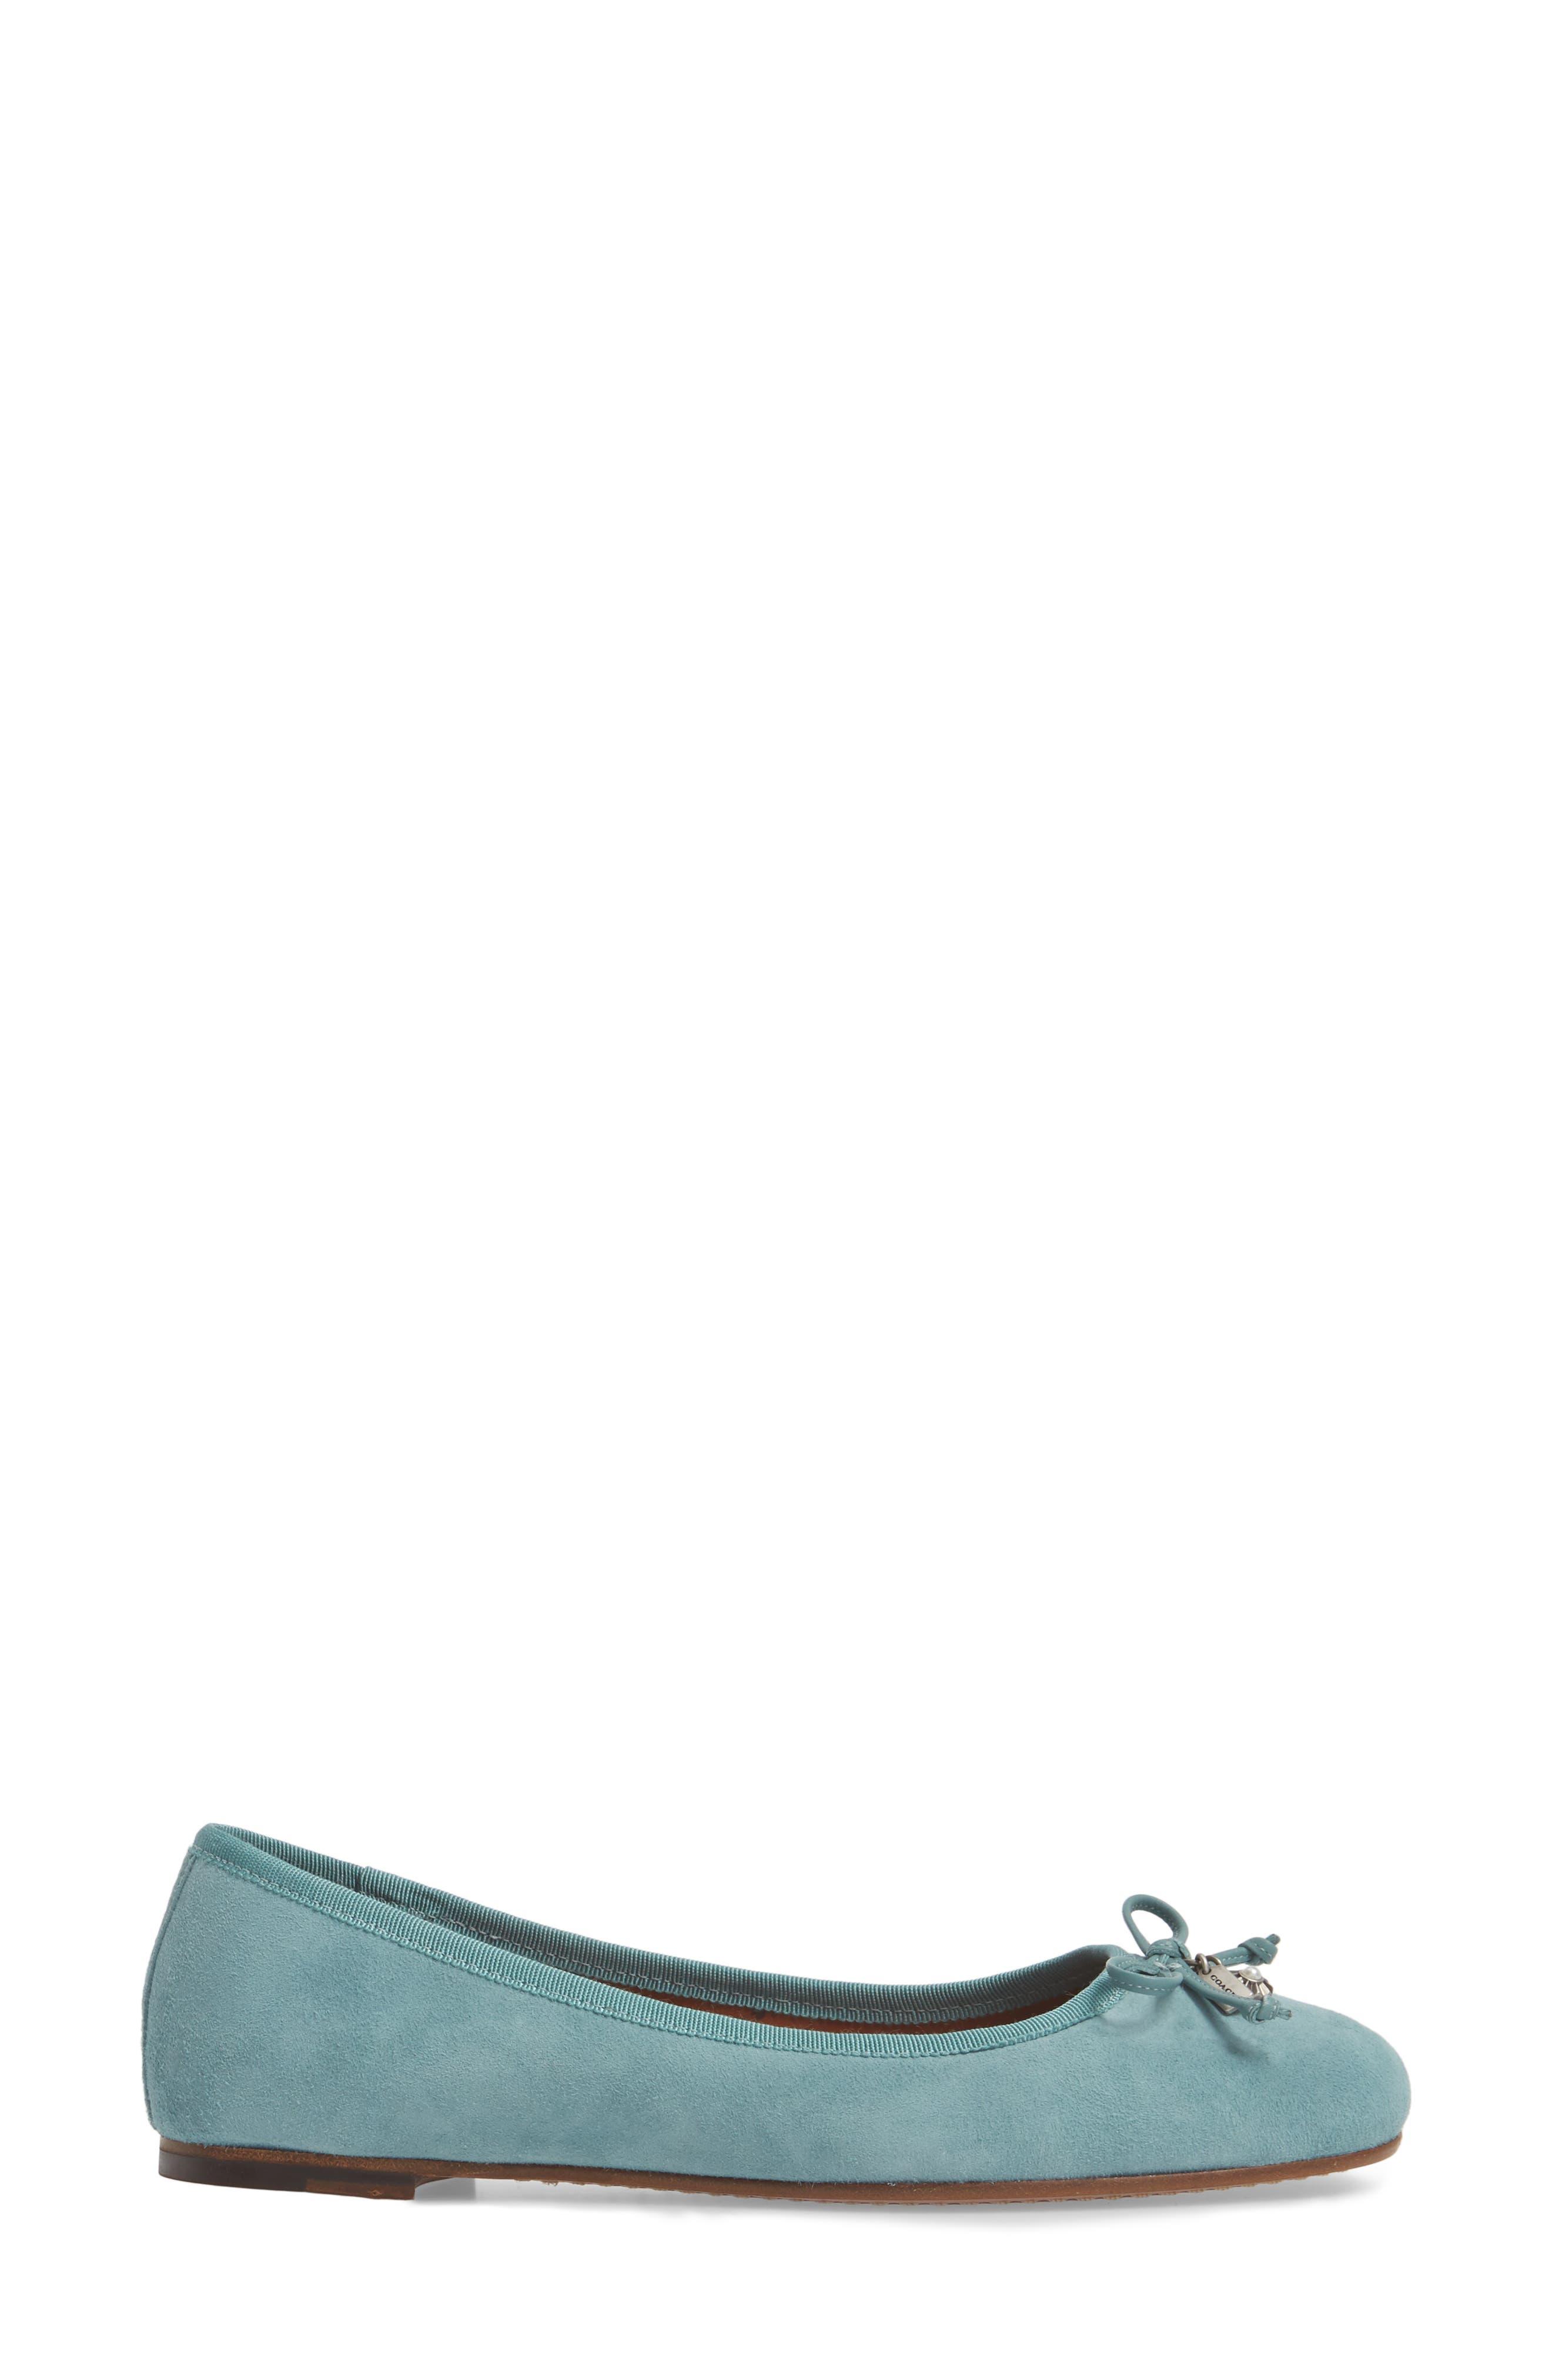 Lola Ballet Flat,                             Alternate thumbnail 3, color,                             Marine Leather